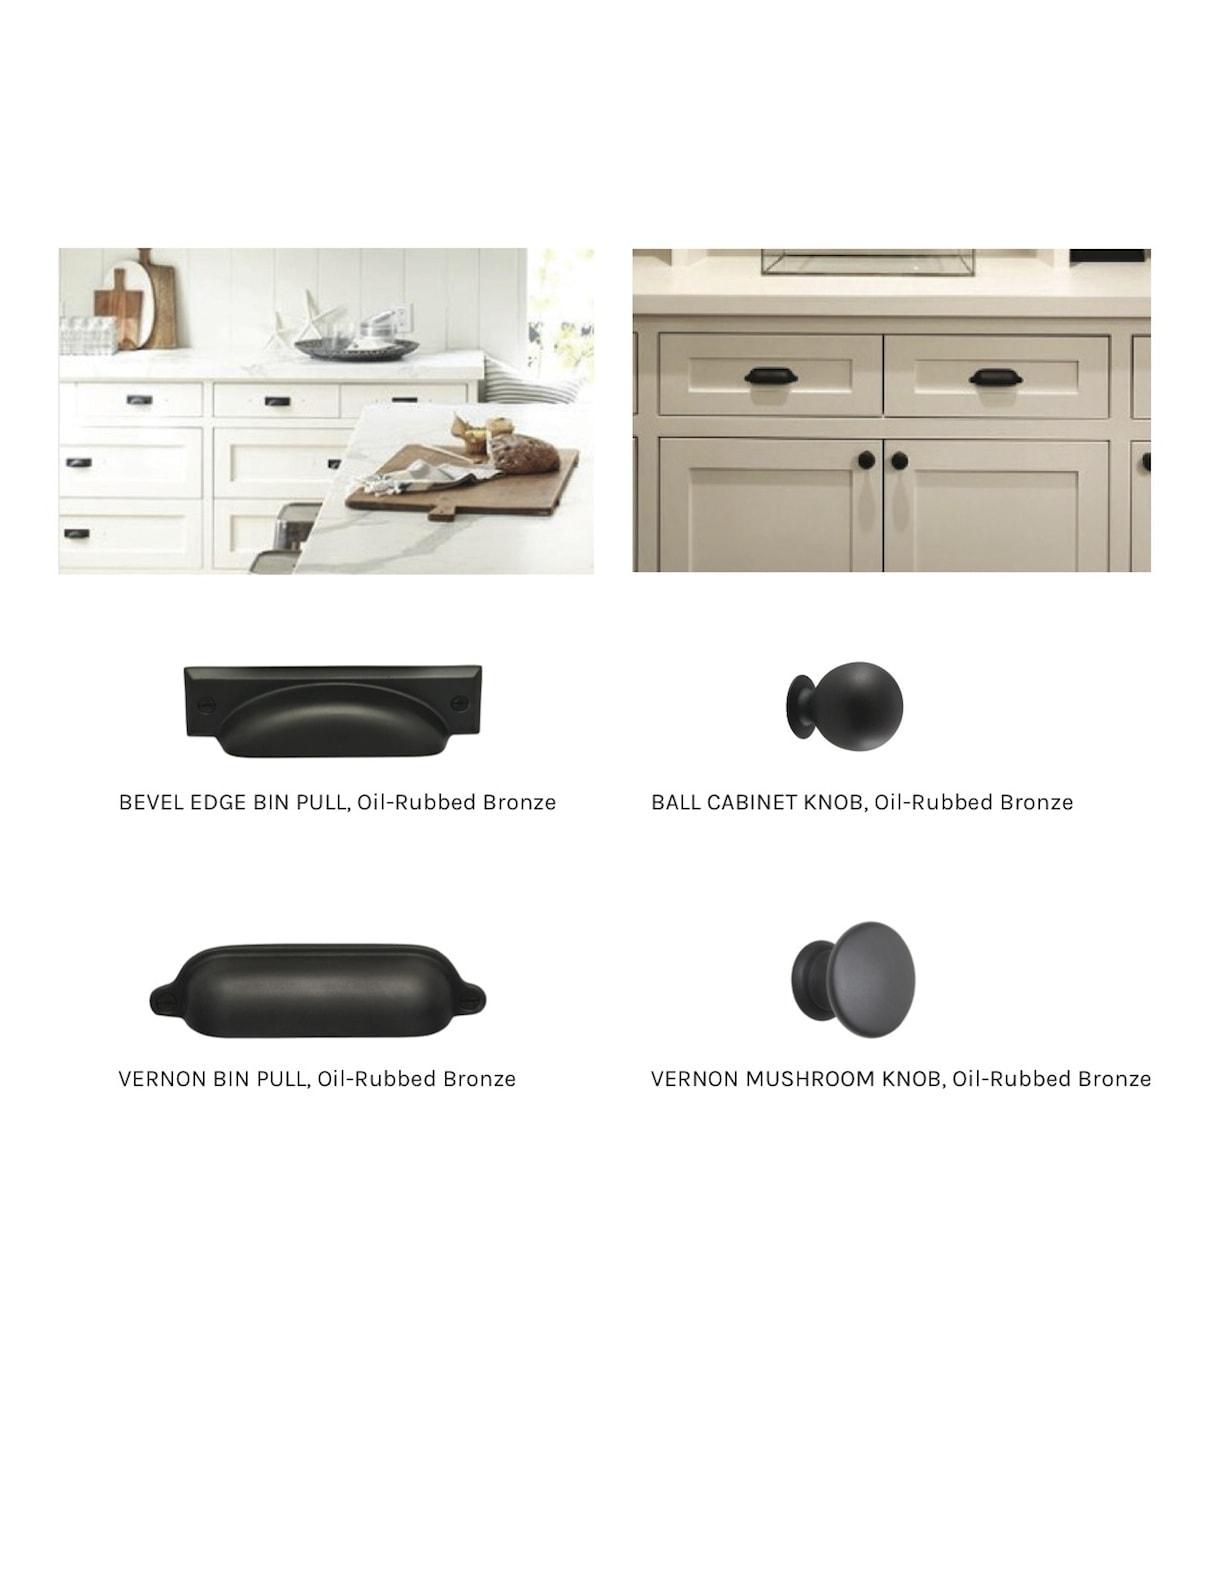 rejuvenation kitchen hardware